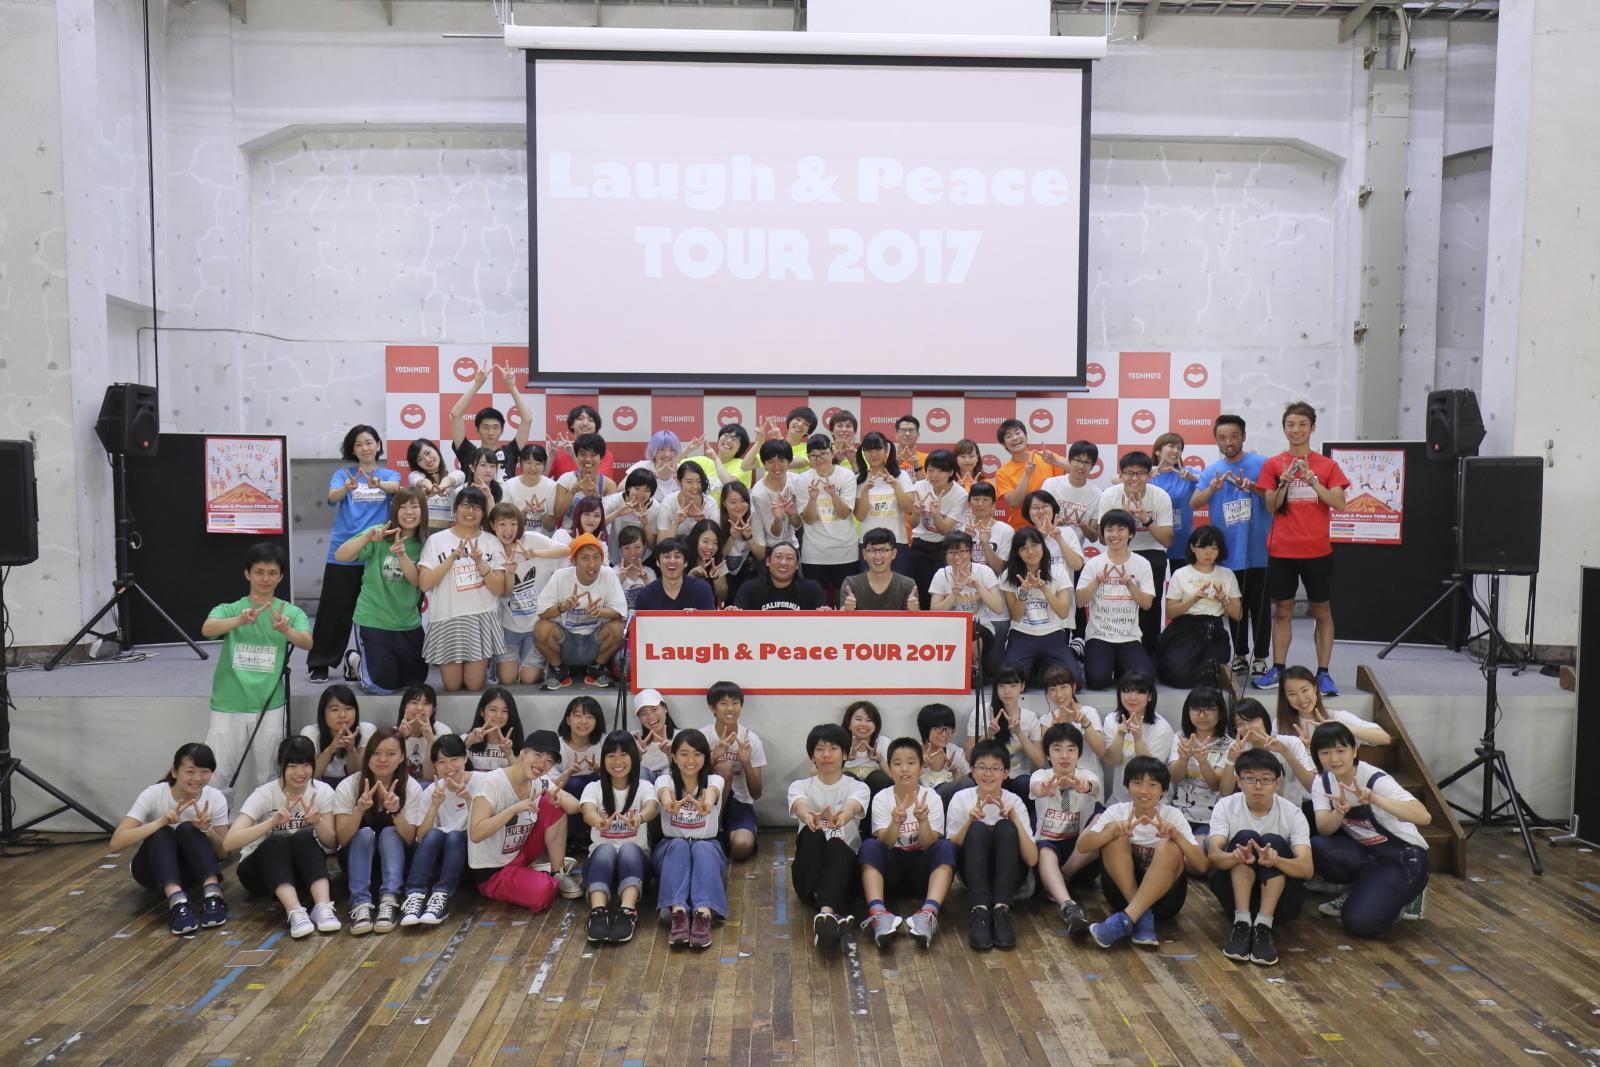 http://news.yoshimoto.co.jp/20170730174035-8abae543daf4f39a1151ab0f8a09ae1709ee342a.jpg